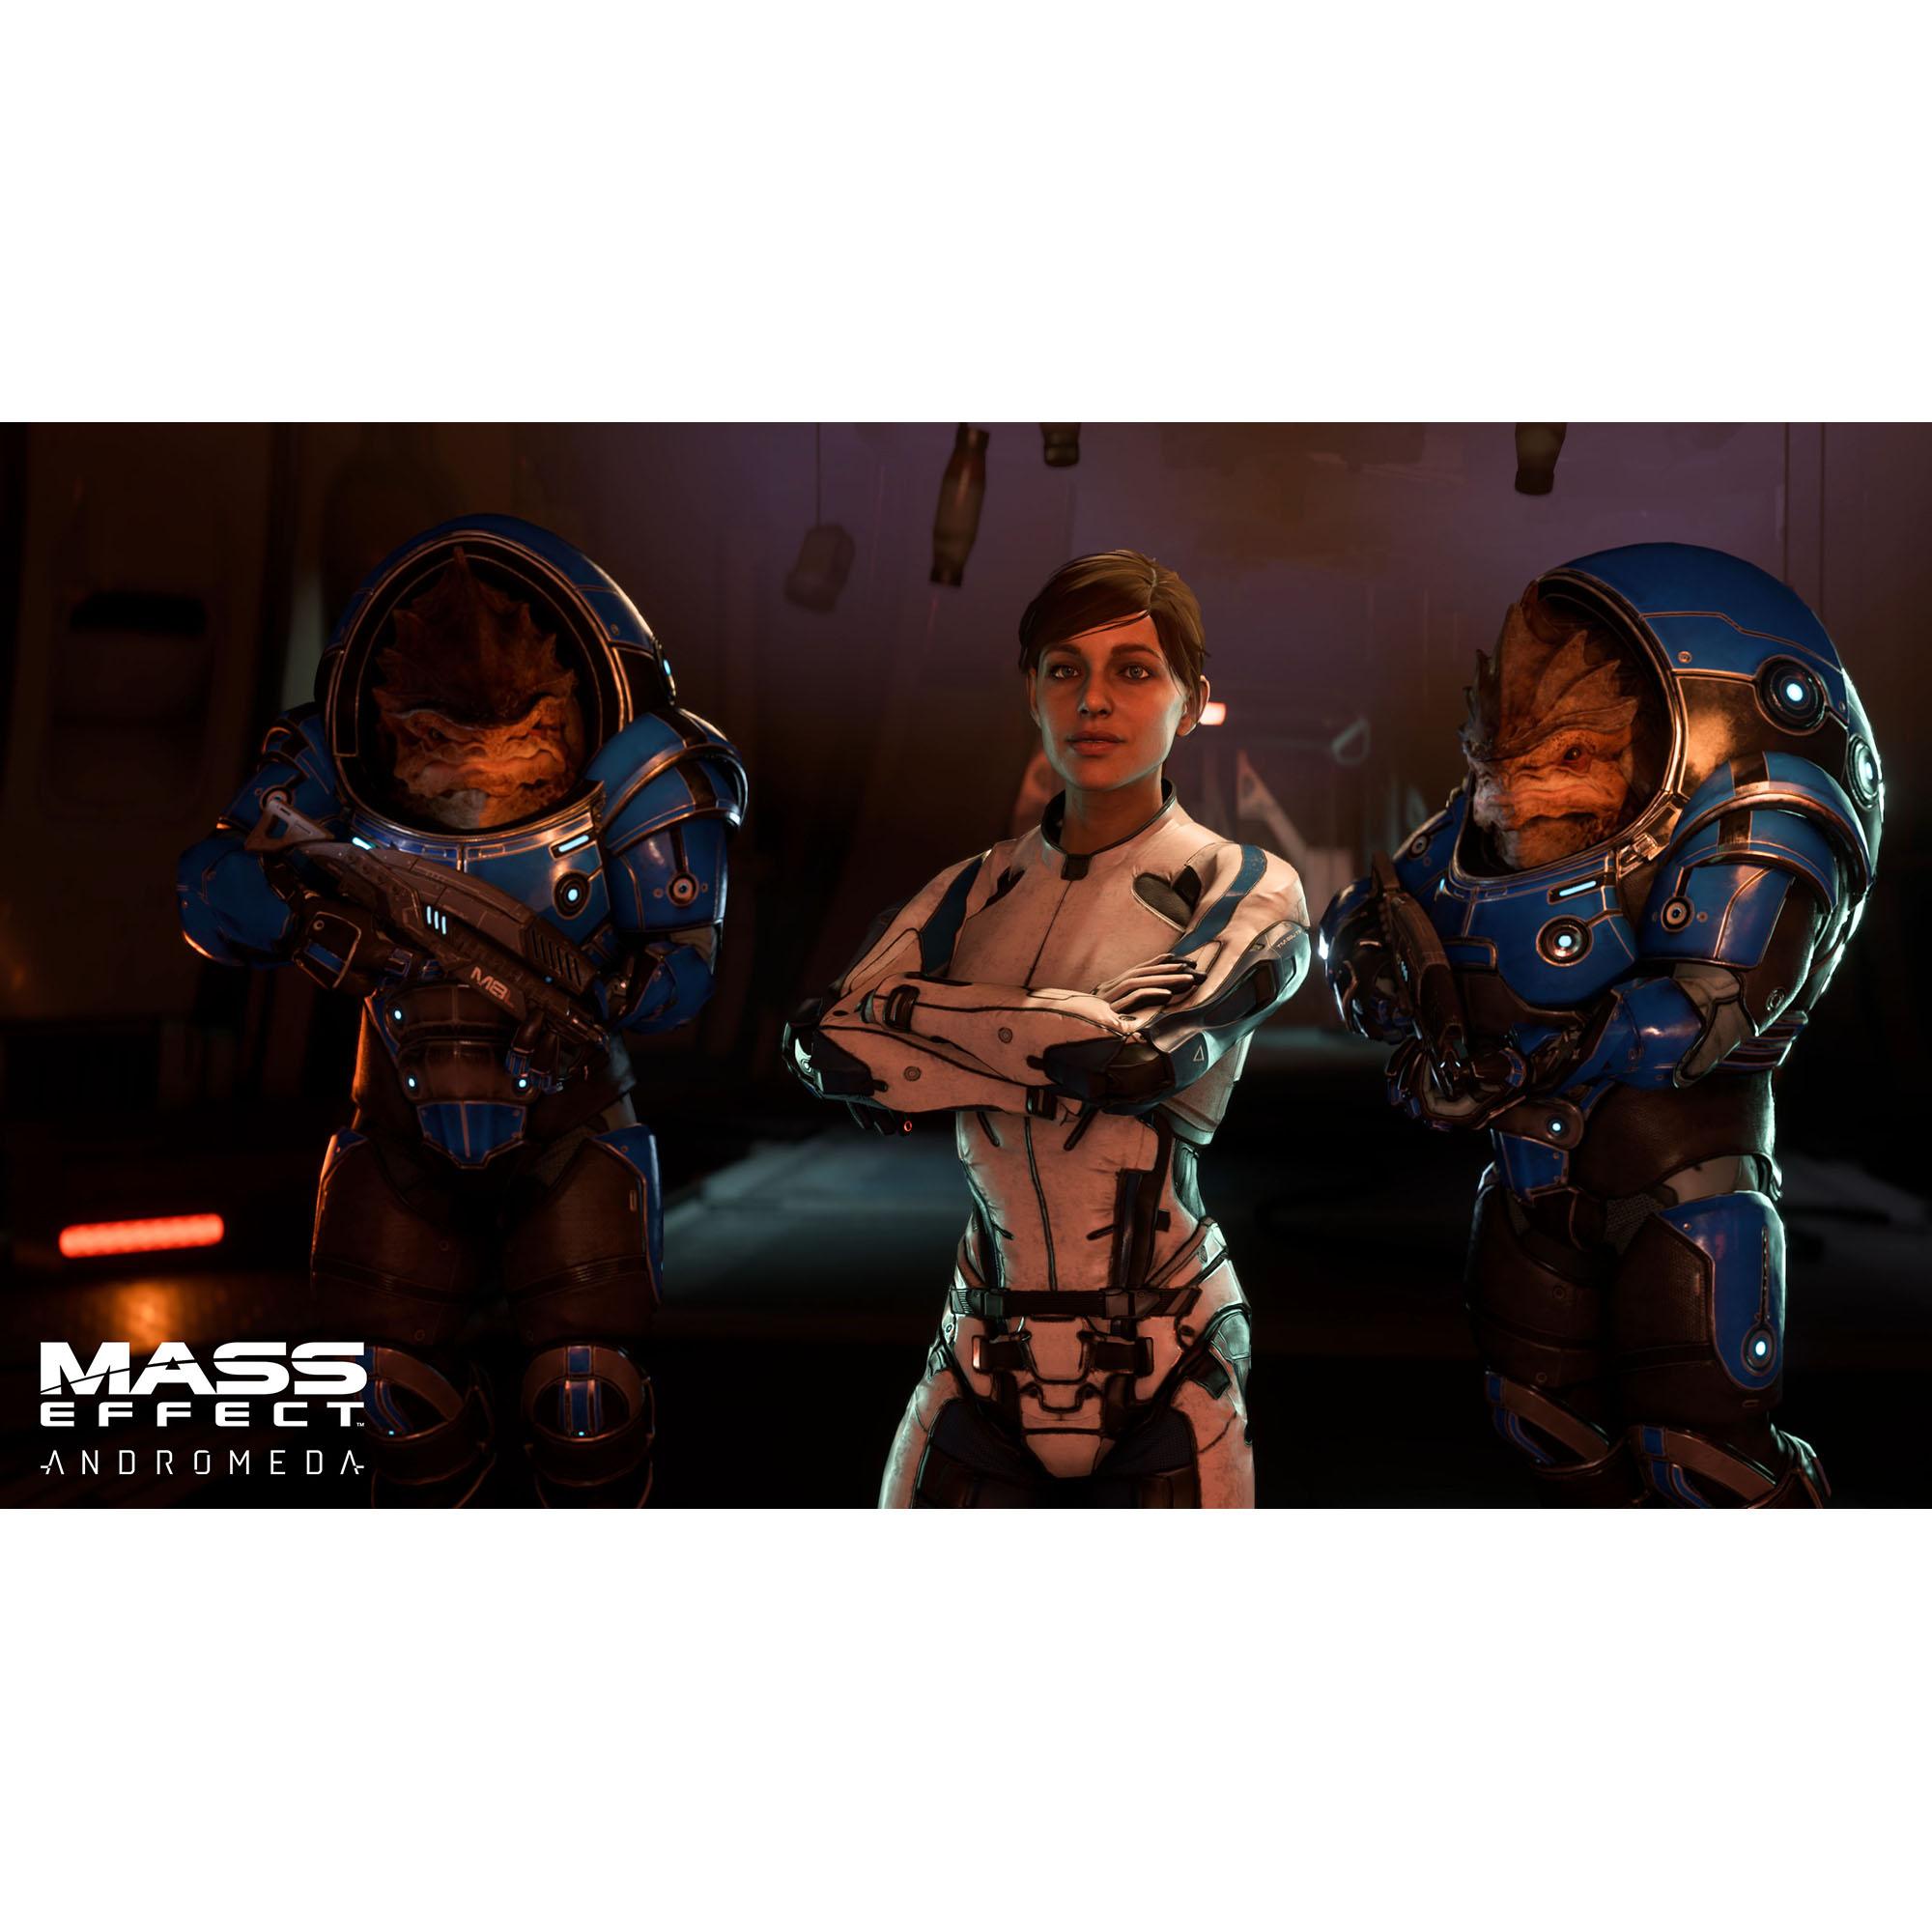 Joc Mass Effect: Andromeda pentru Xbox One 2